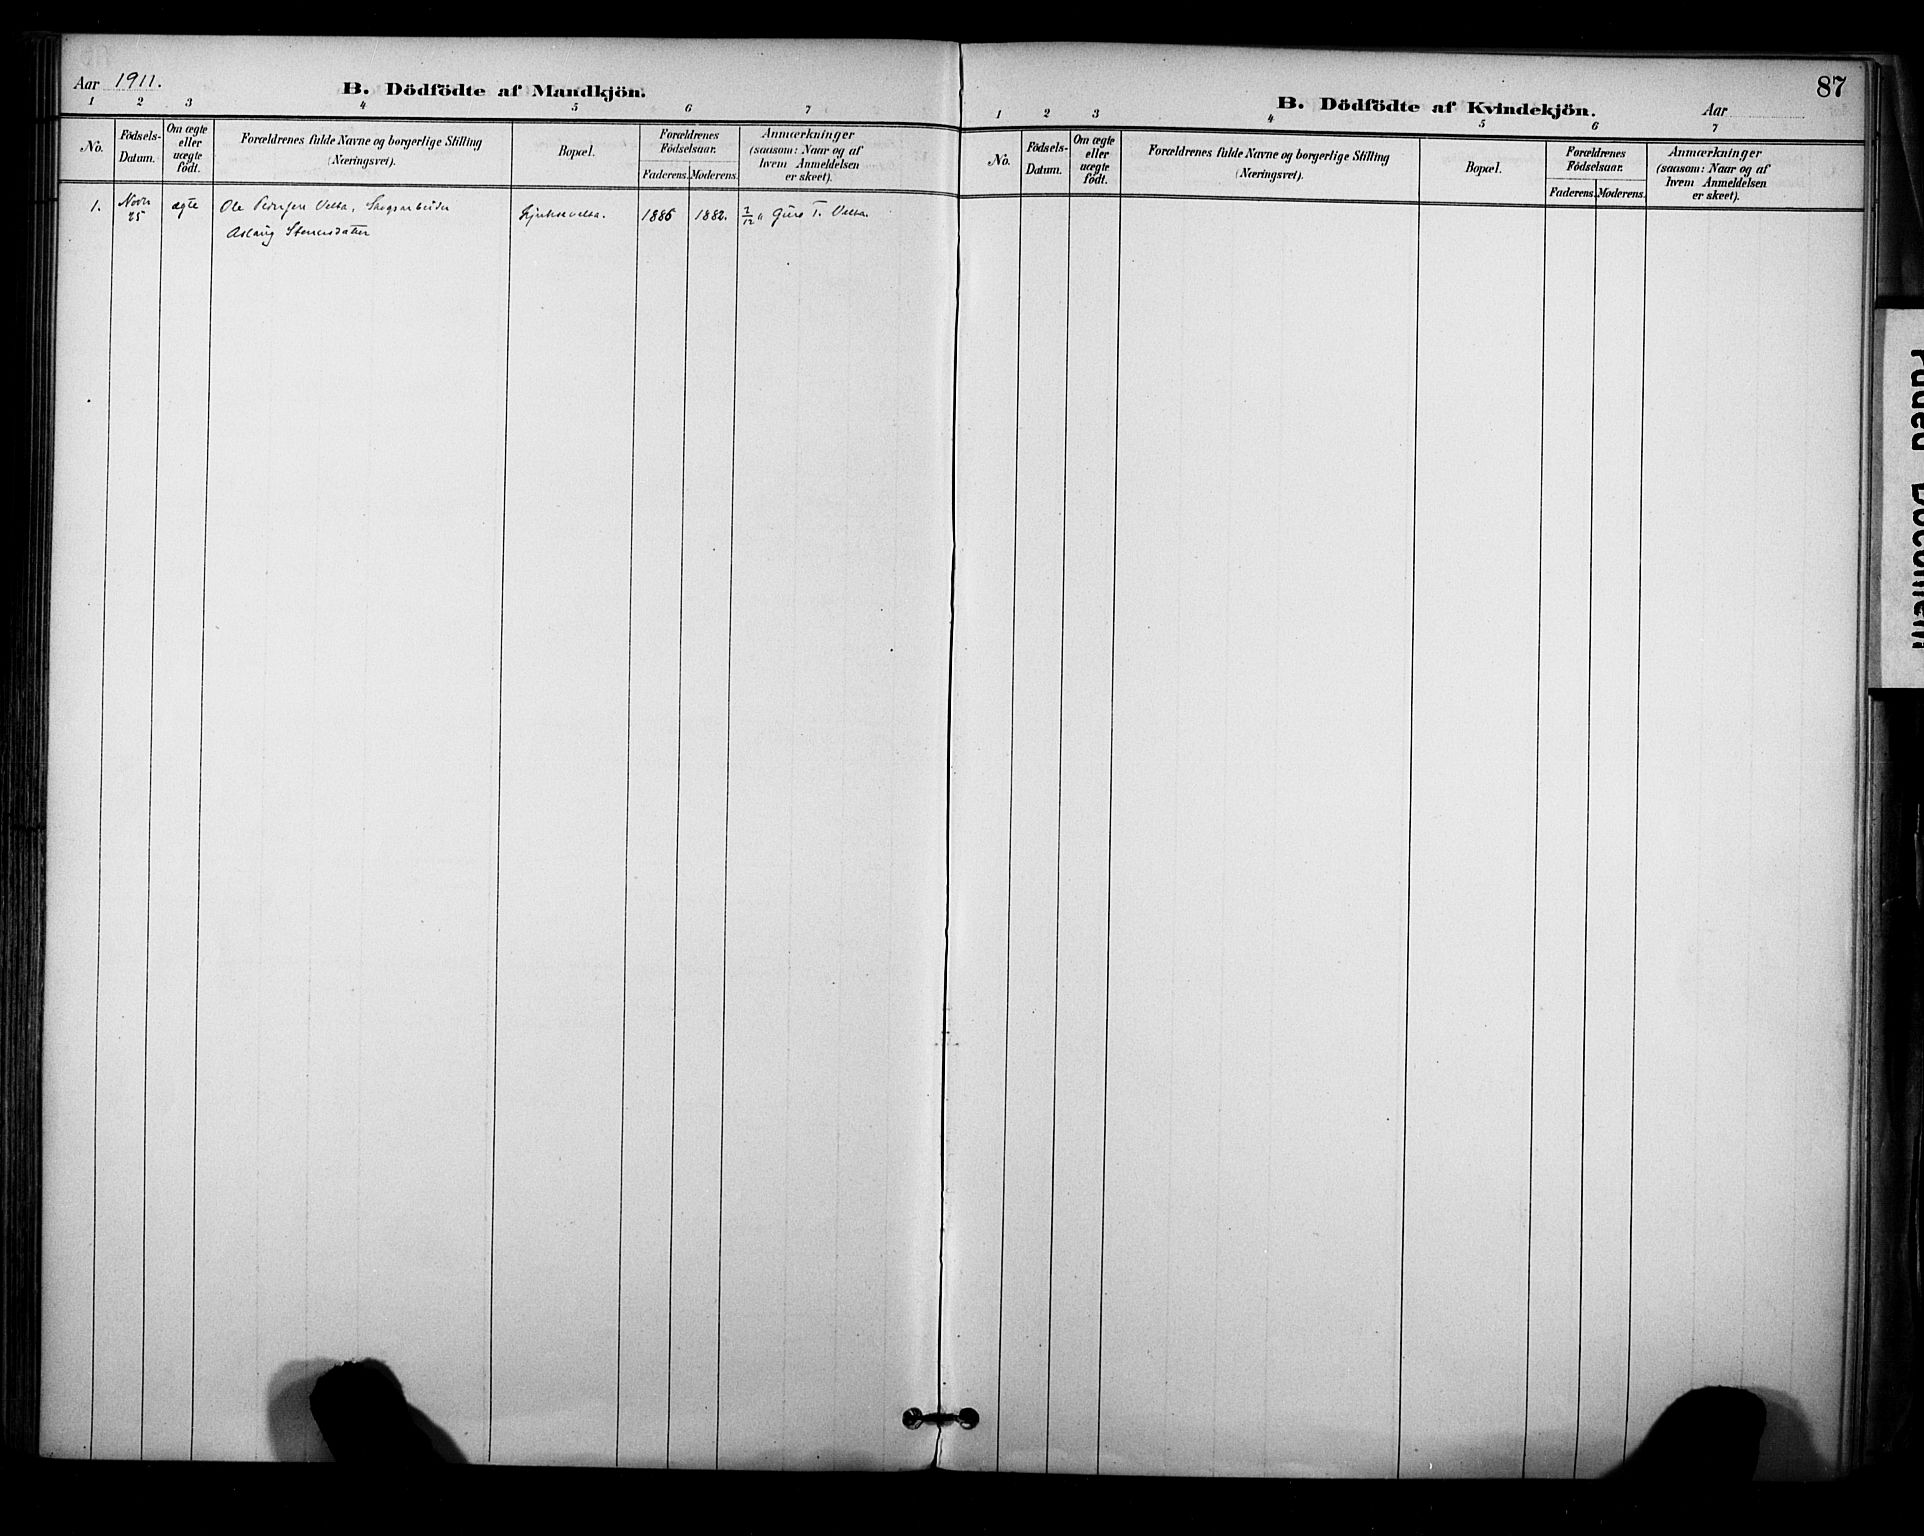 SAKO, Sauherad kirkebøker, F/Fa/L0009: Ministerialbok nr. I 9, 1887-1912, s. 87